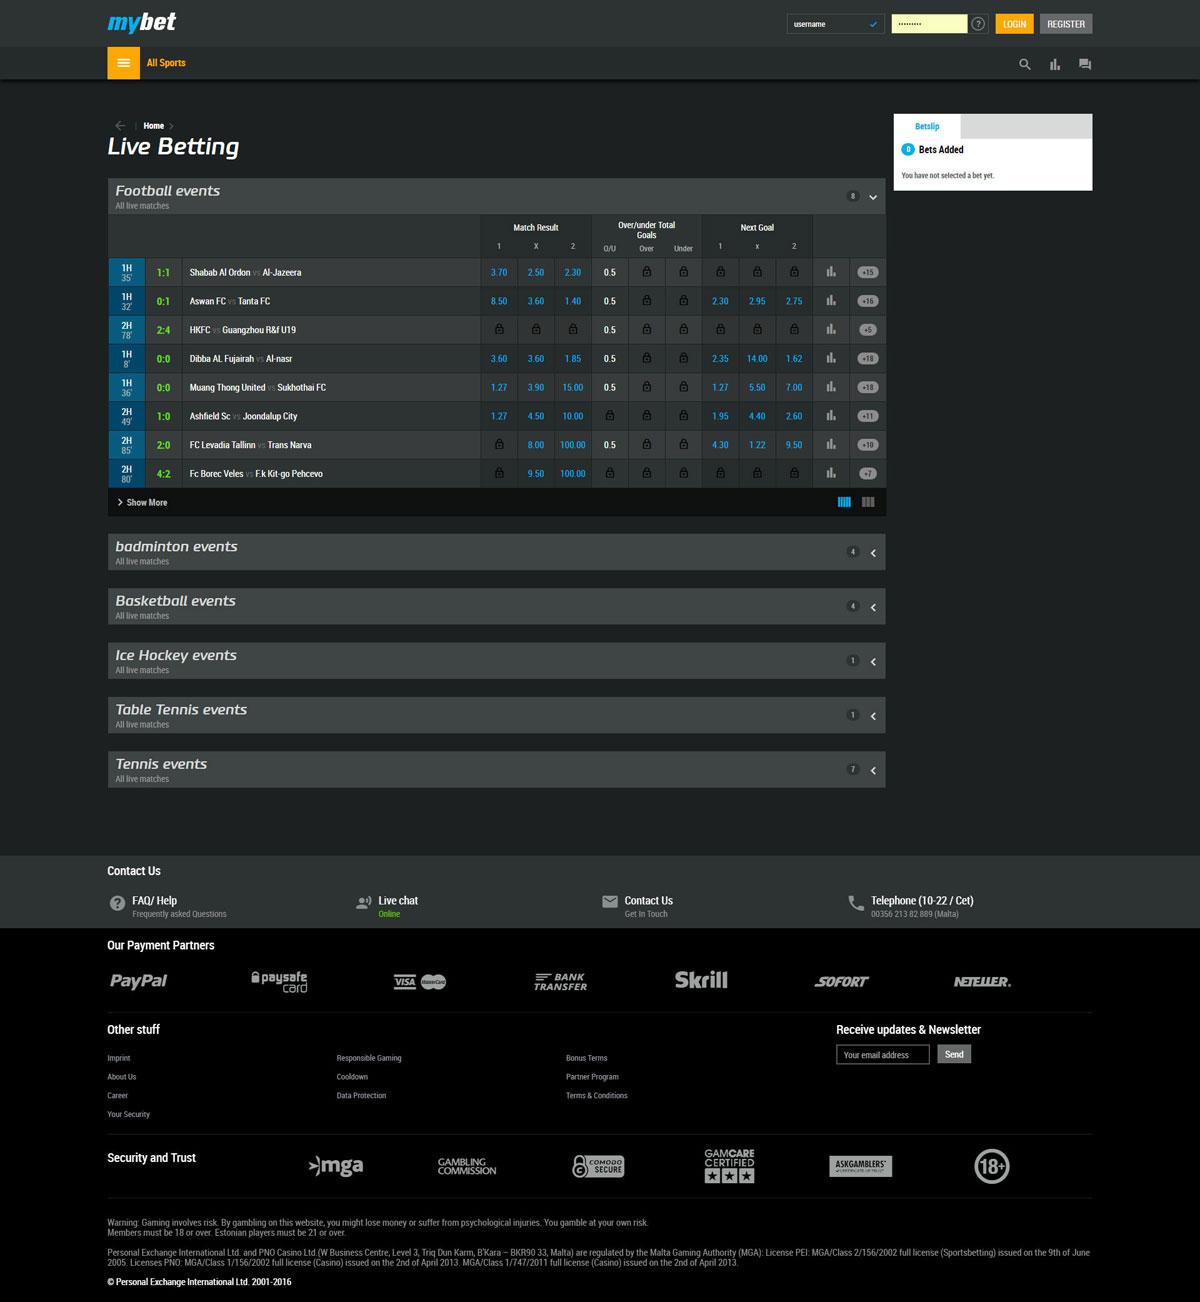 mybet casino download